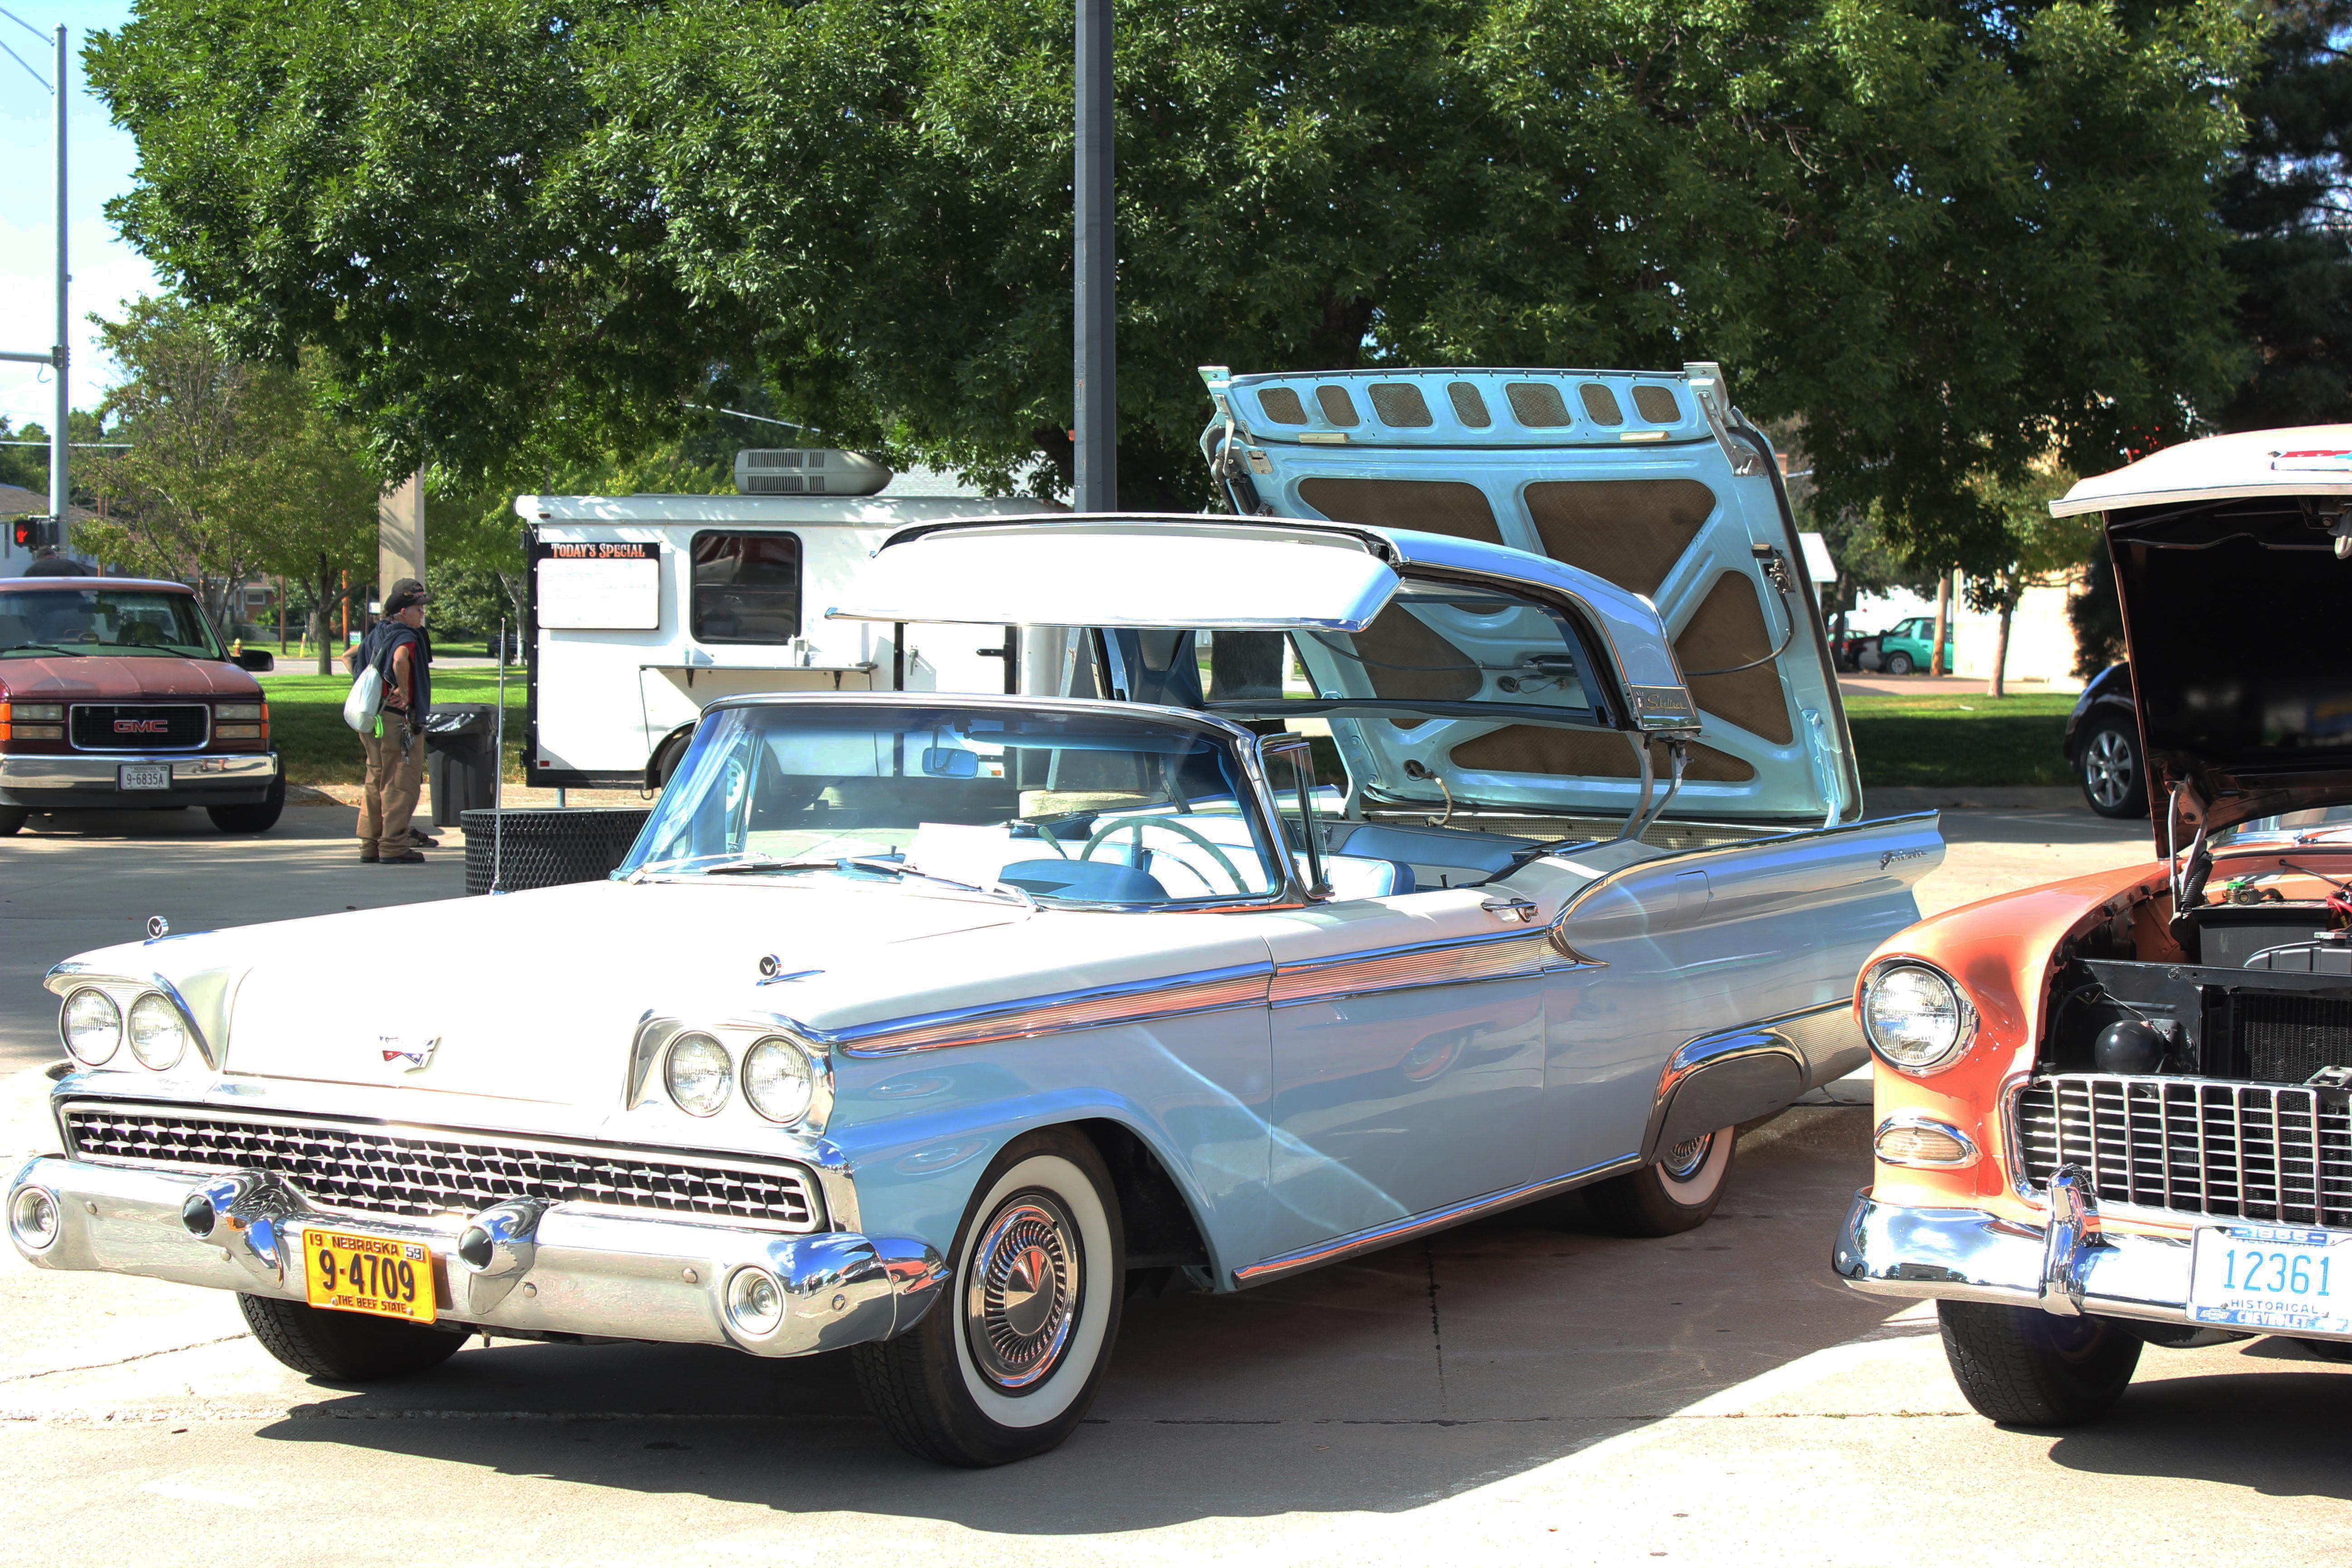 Community 50s car show & food truck